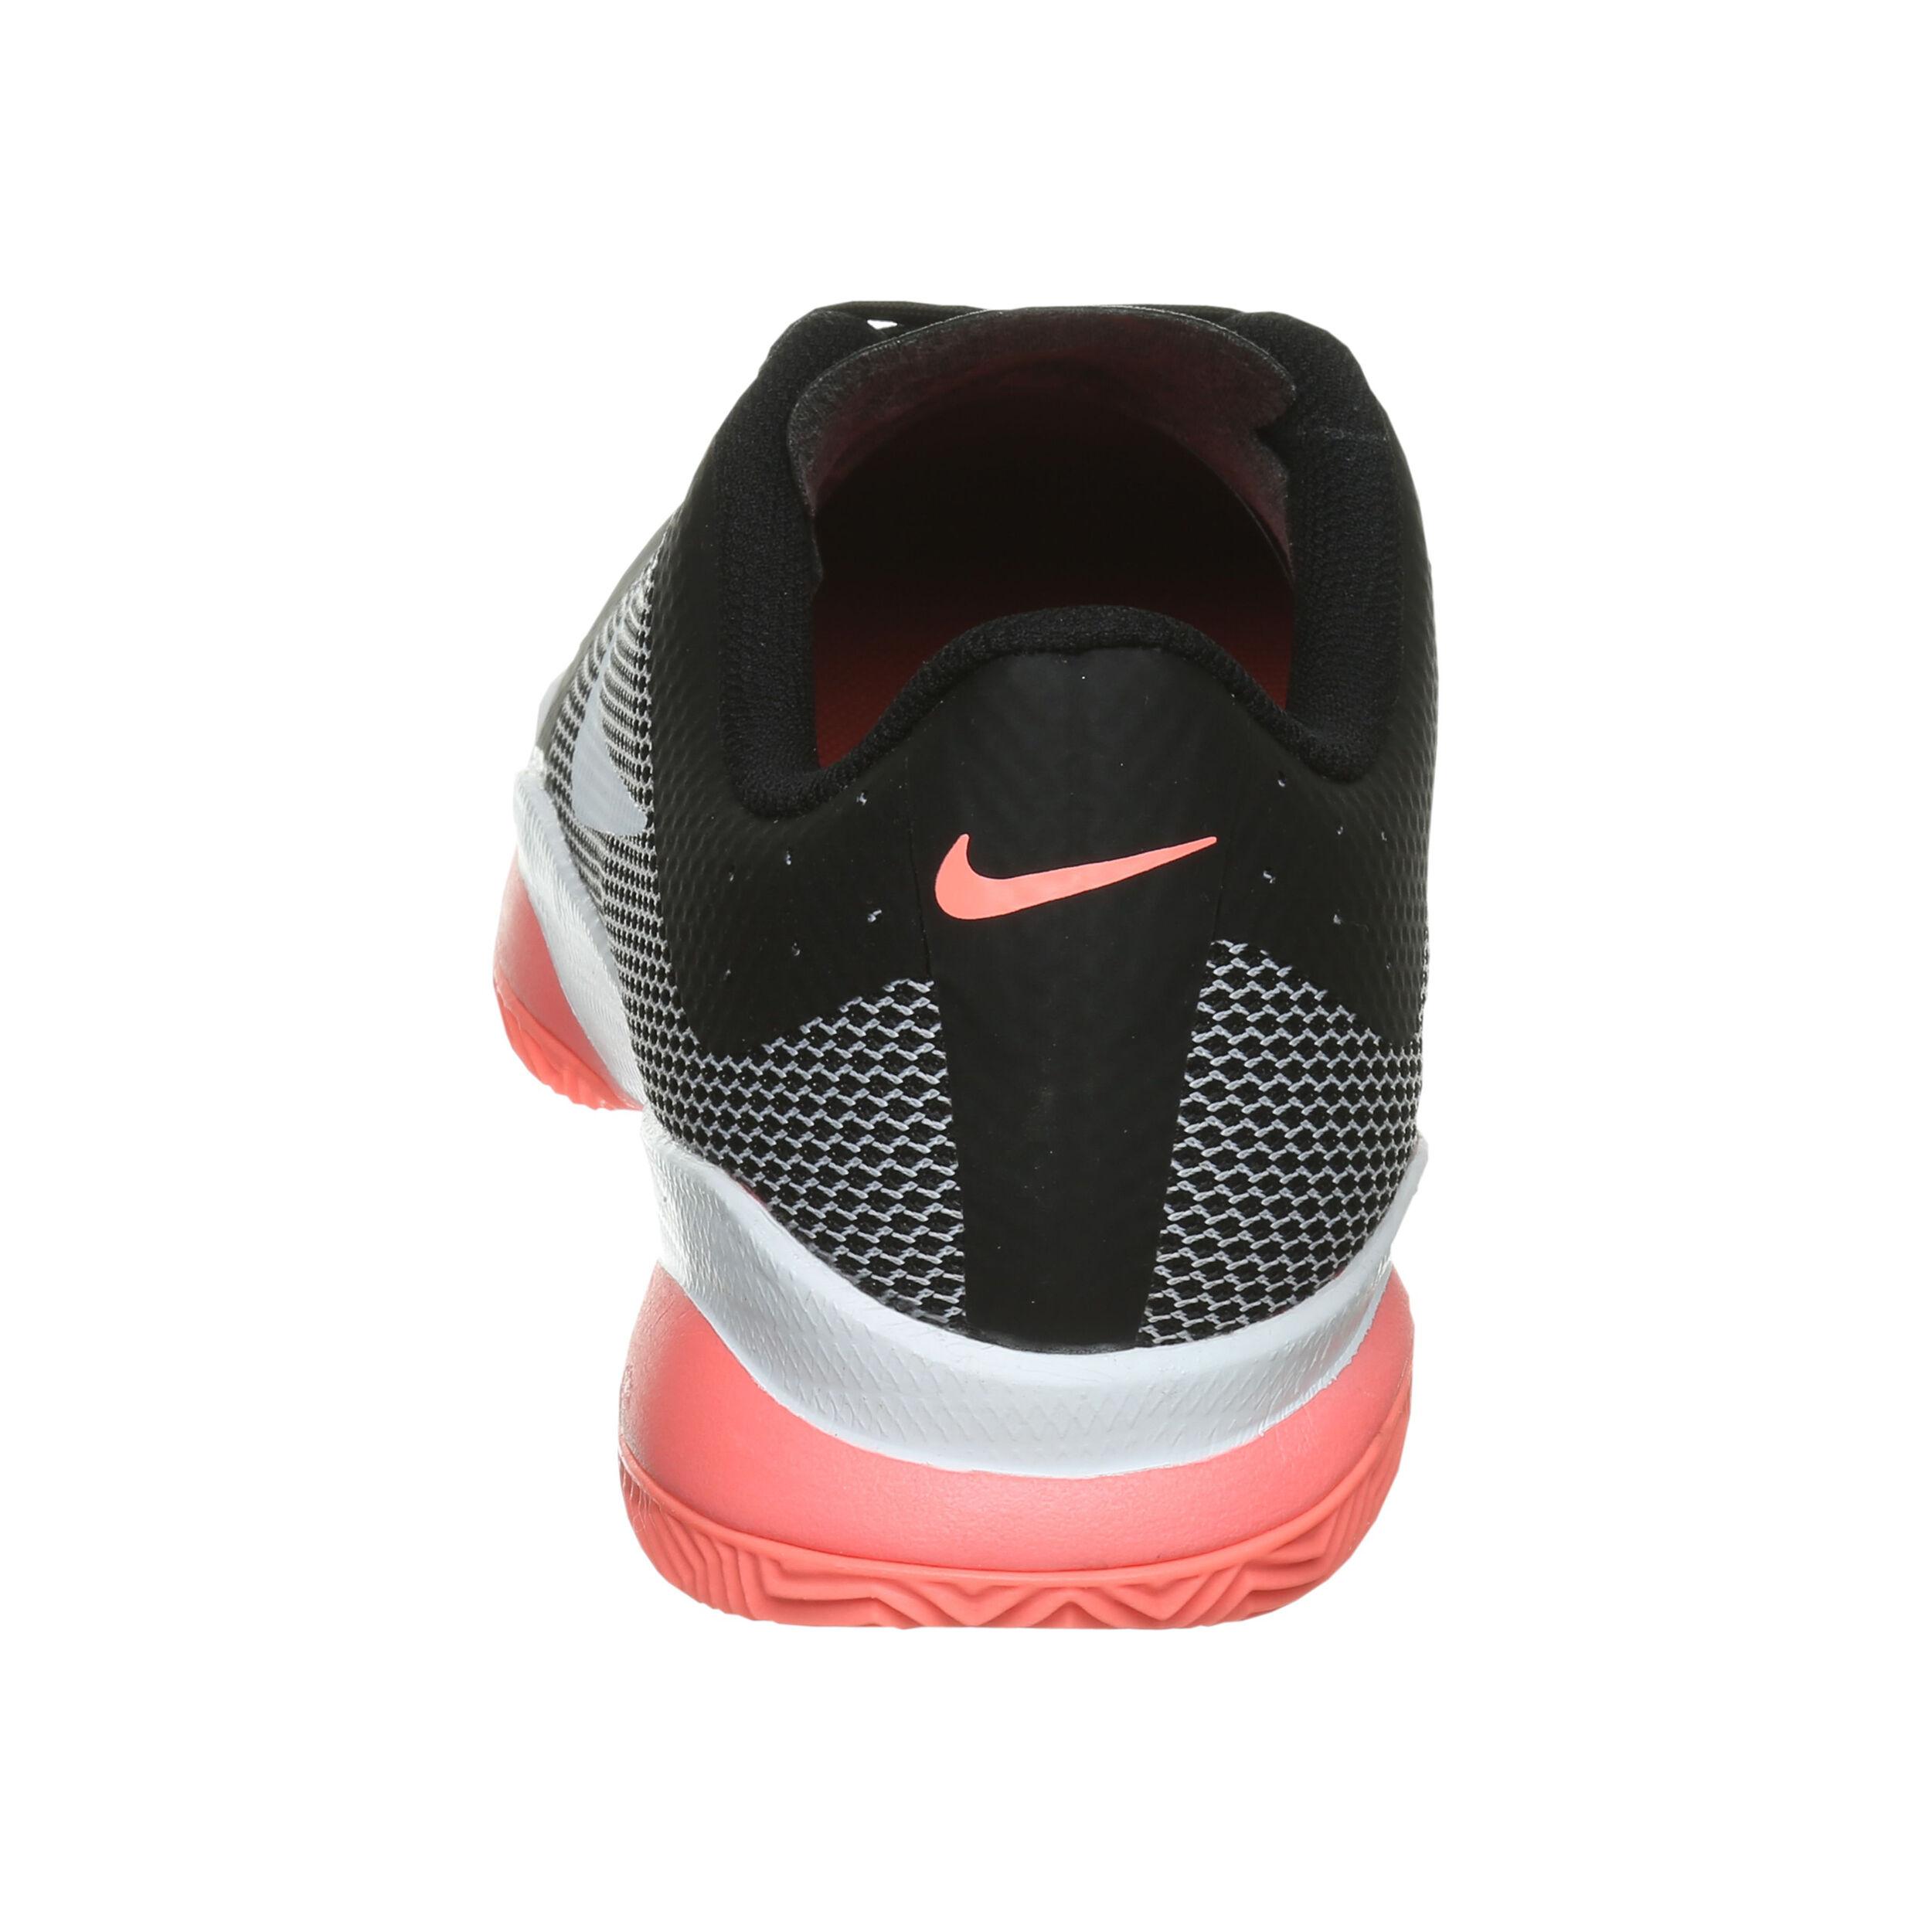 Nike Air Zoom Ultra Clay Gravelschoen Dames Zwart, Wit